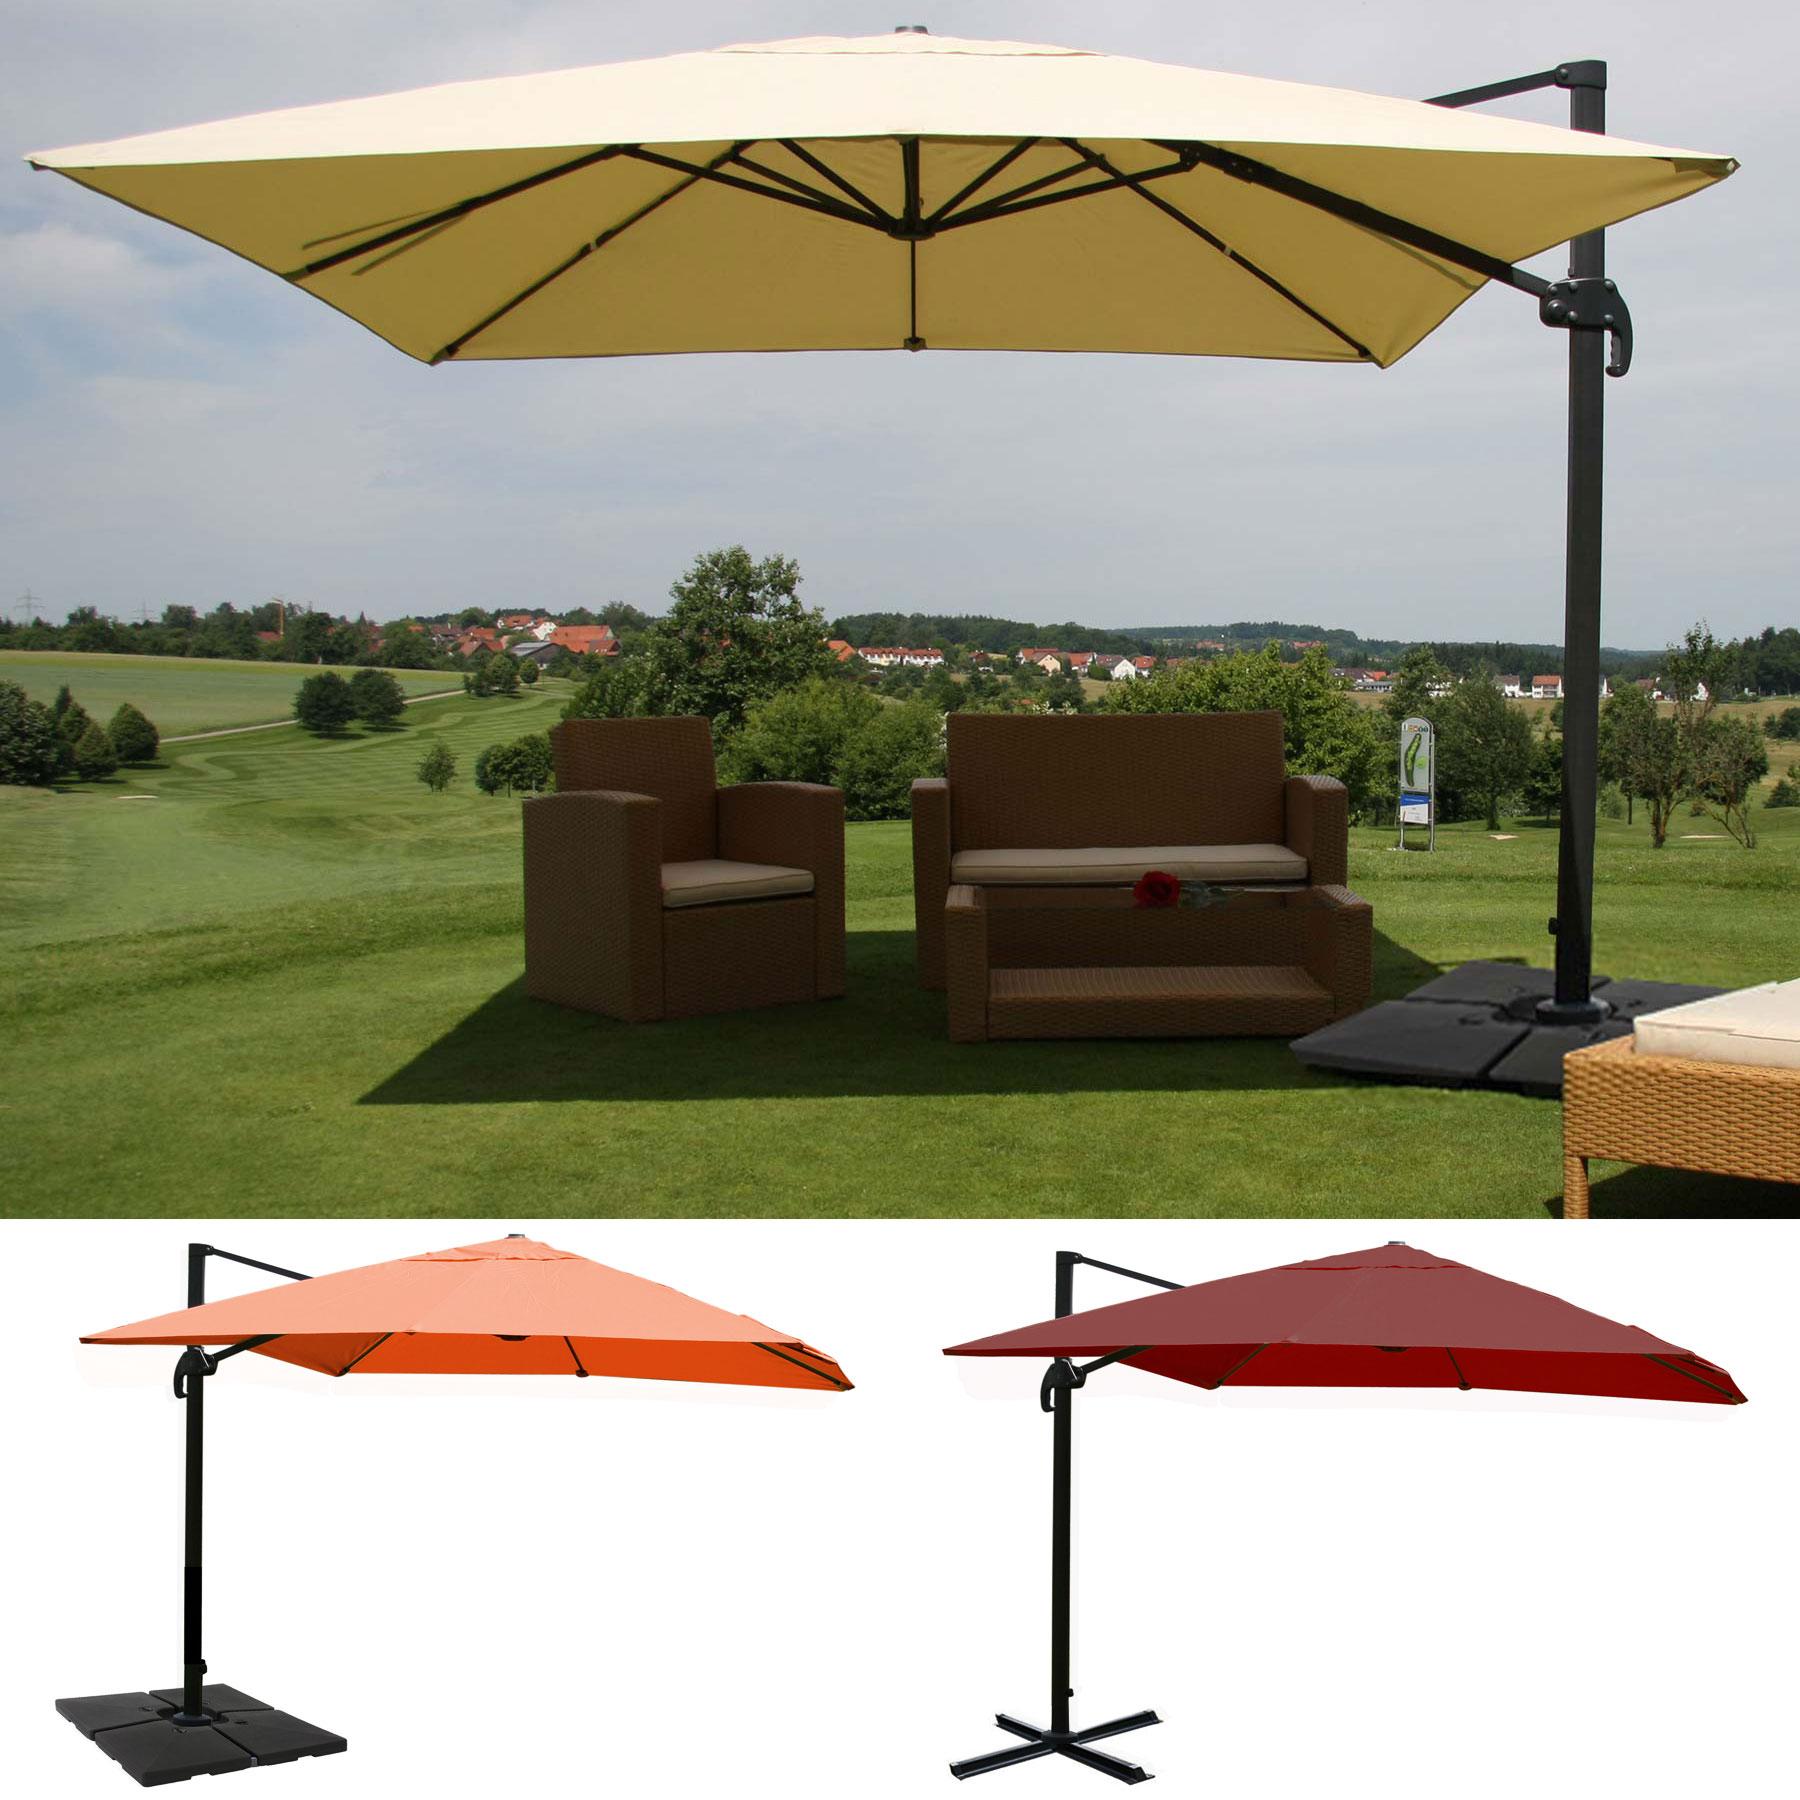 gastronomie luxus ampelschirm n22 sonnenschirm 3x4m ebay. Black Bedroom Furniture Sets. Home Design Ideas